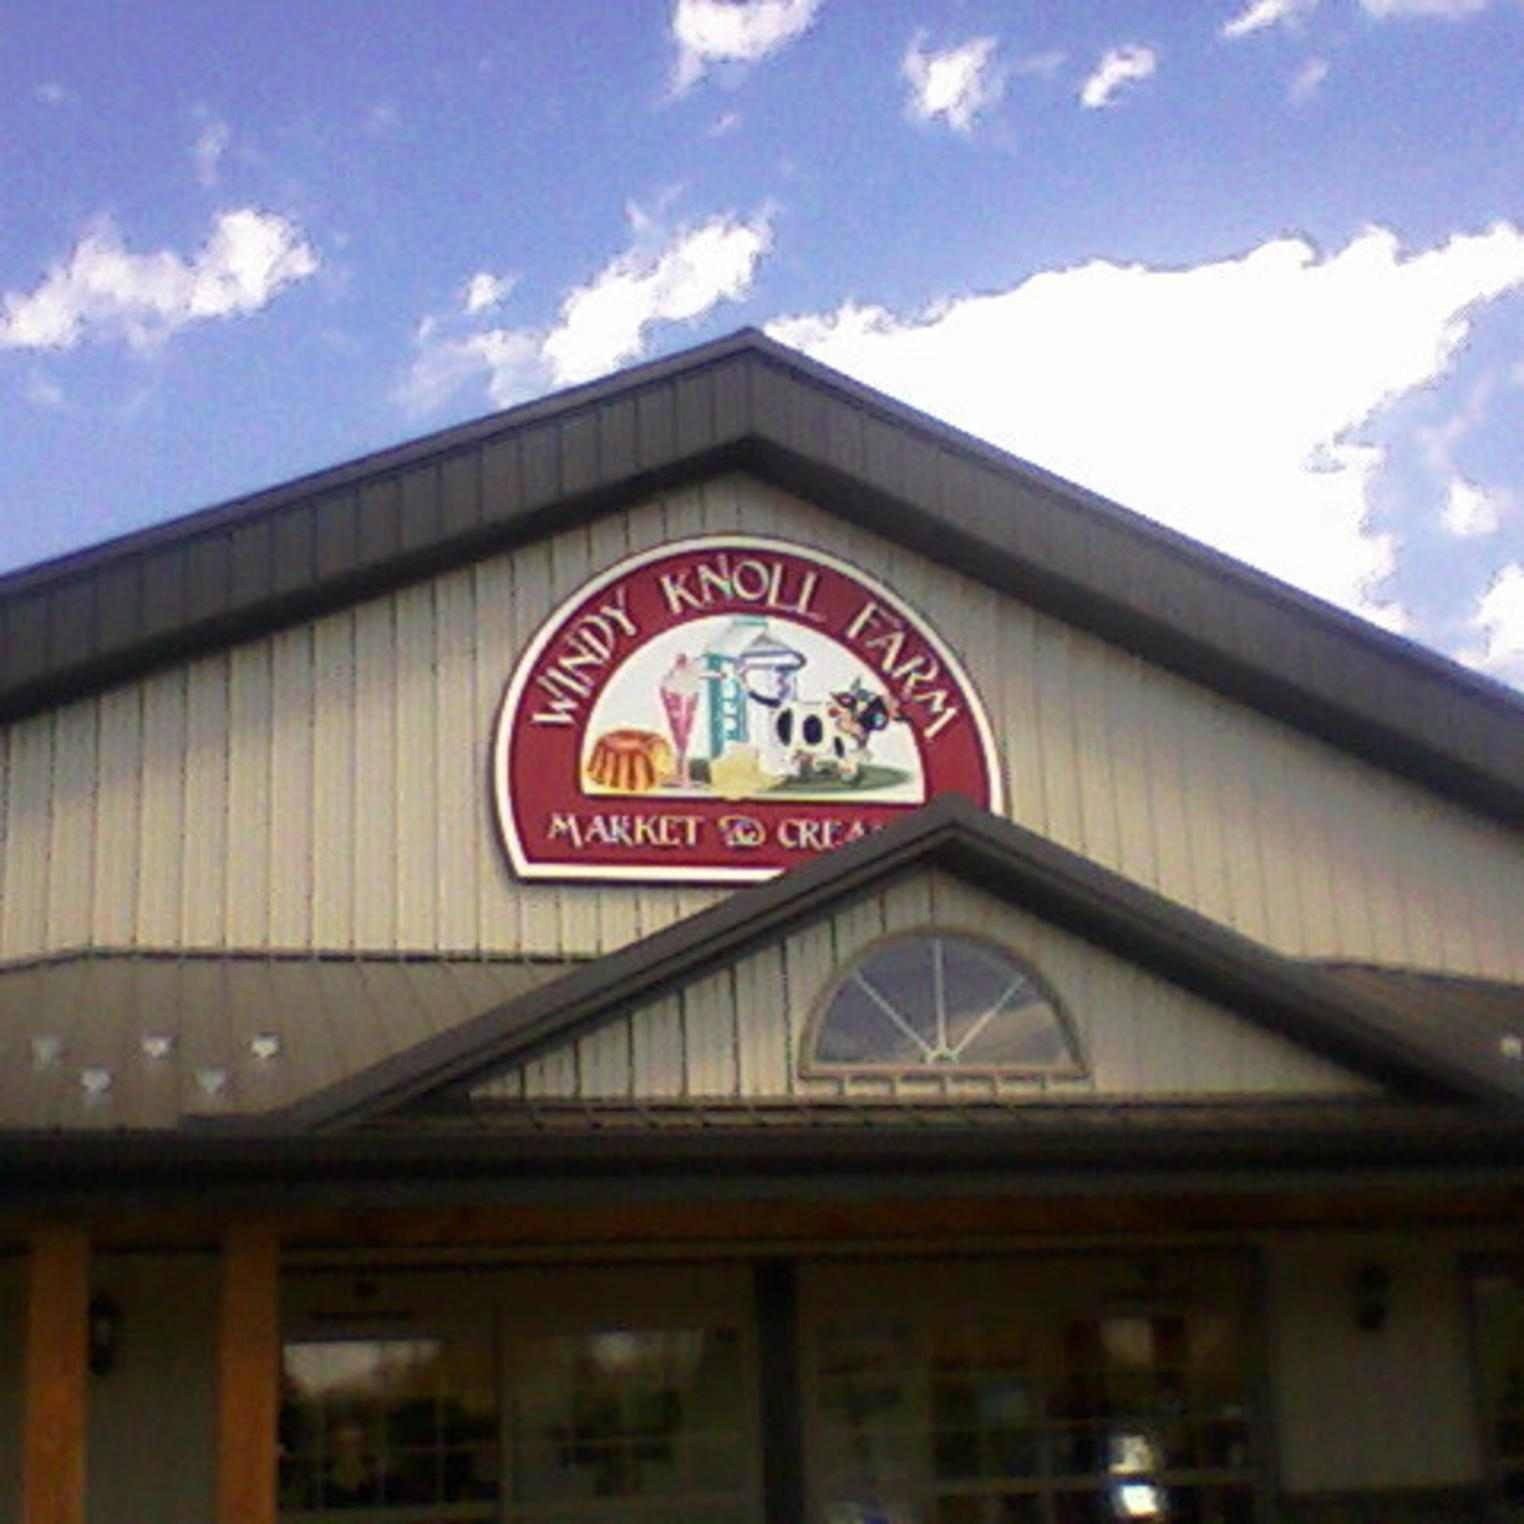 Windy Knoll Farm Market & Creamery